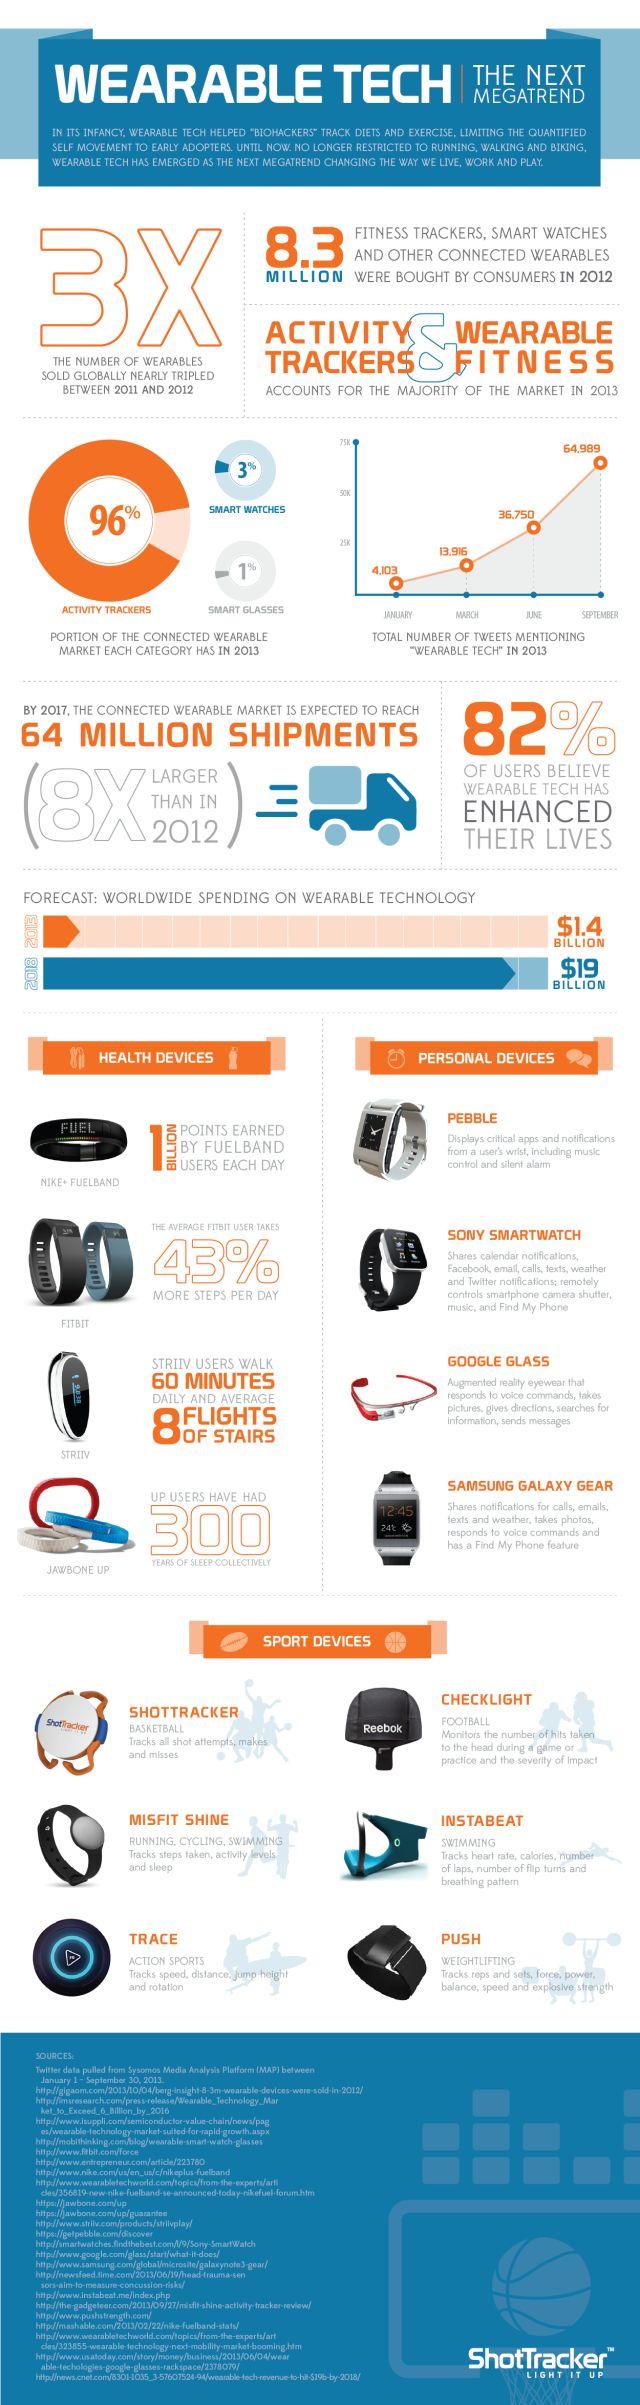 #Wearable tech the next megatrend